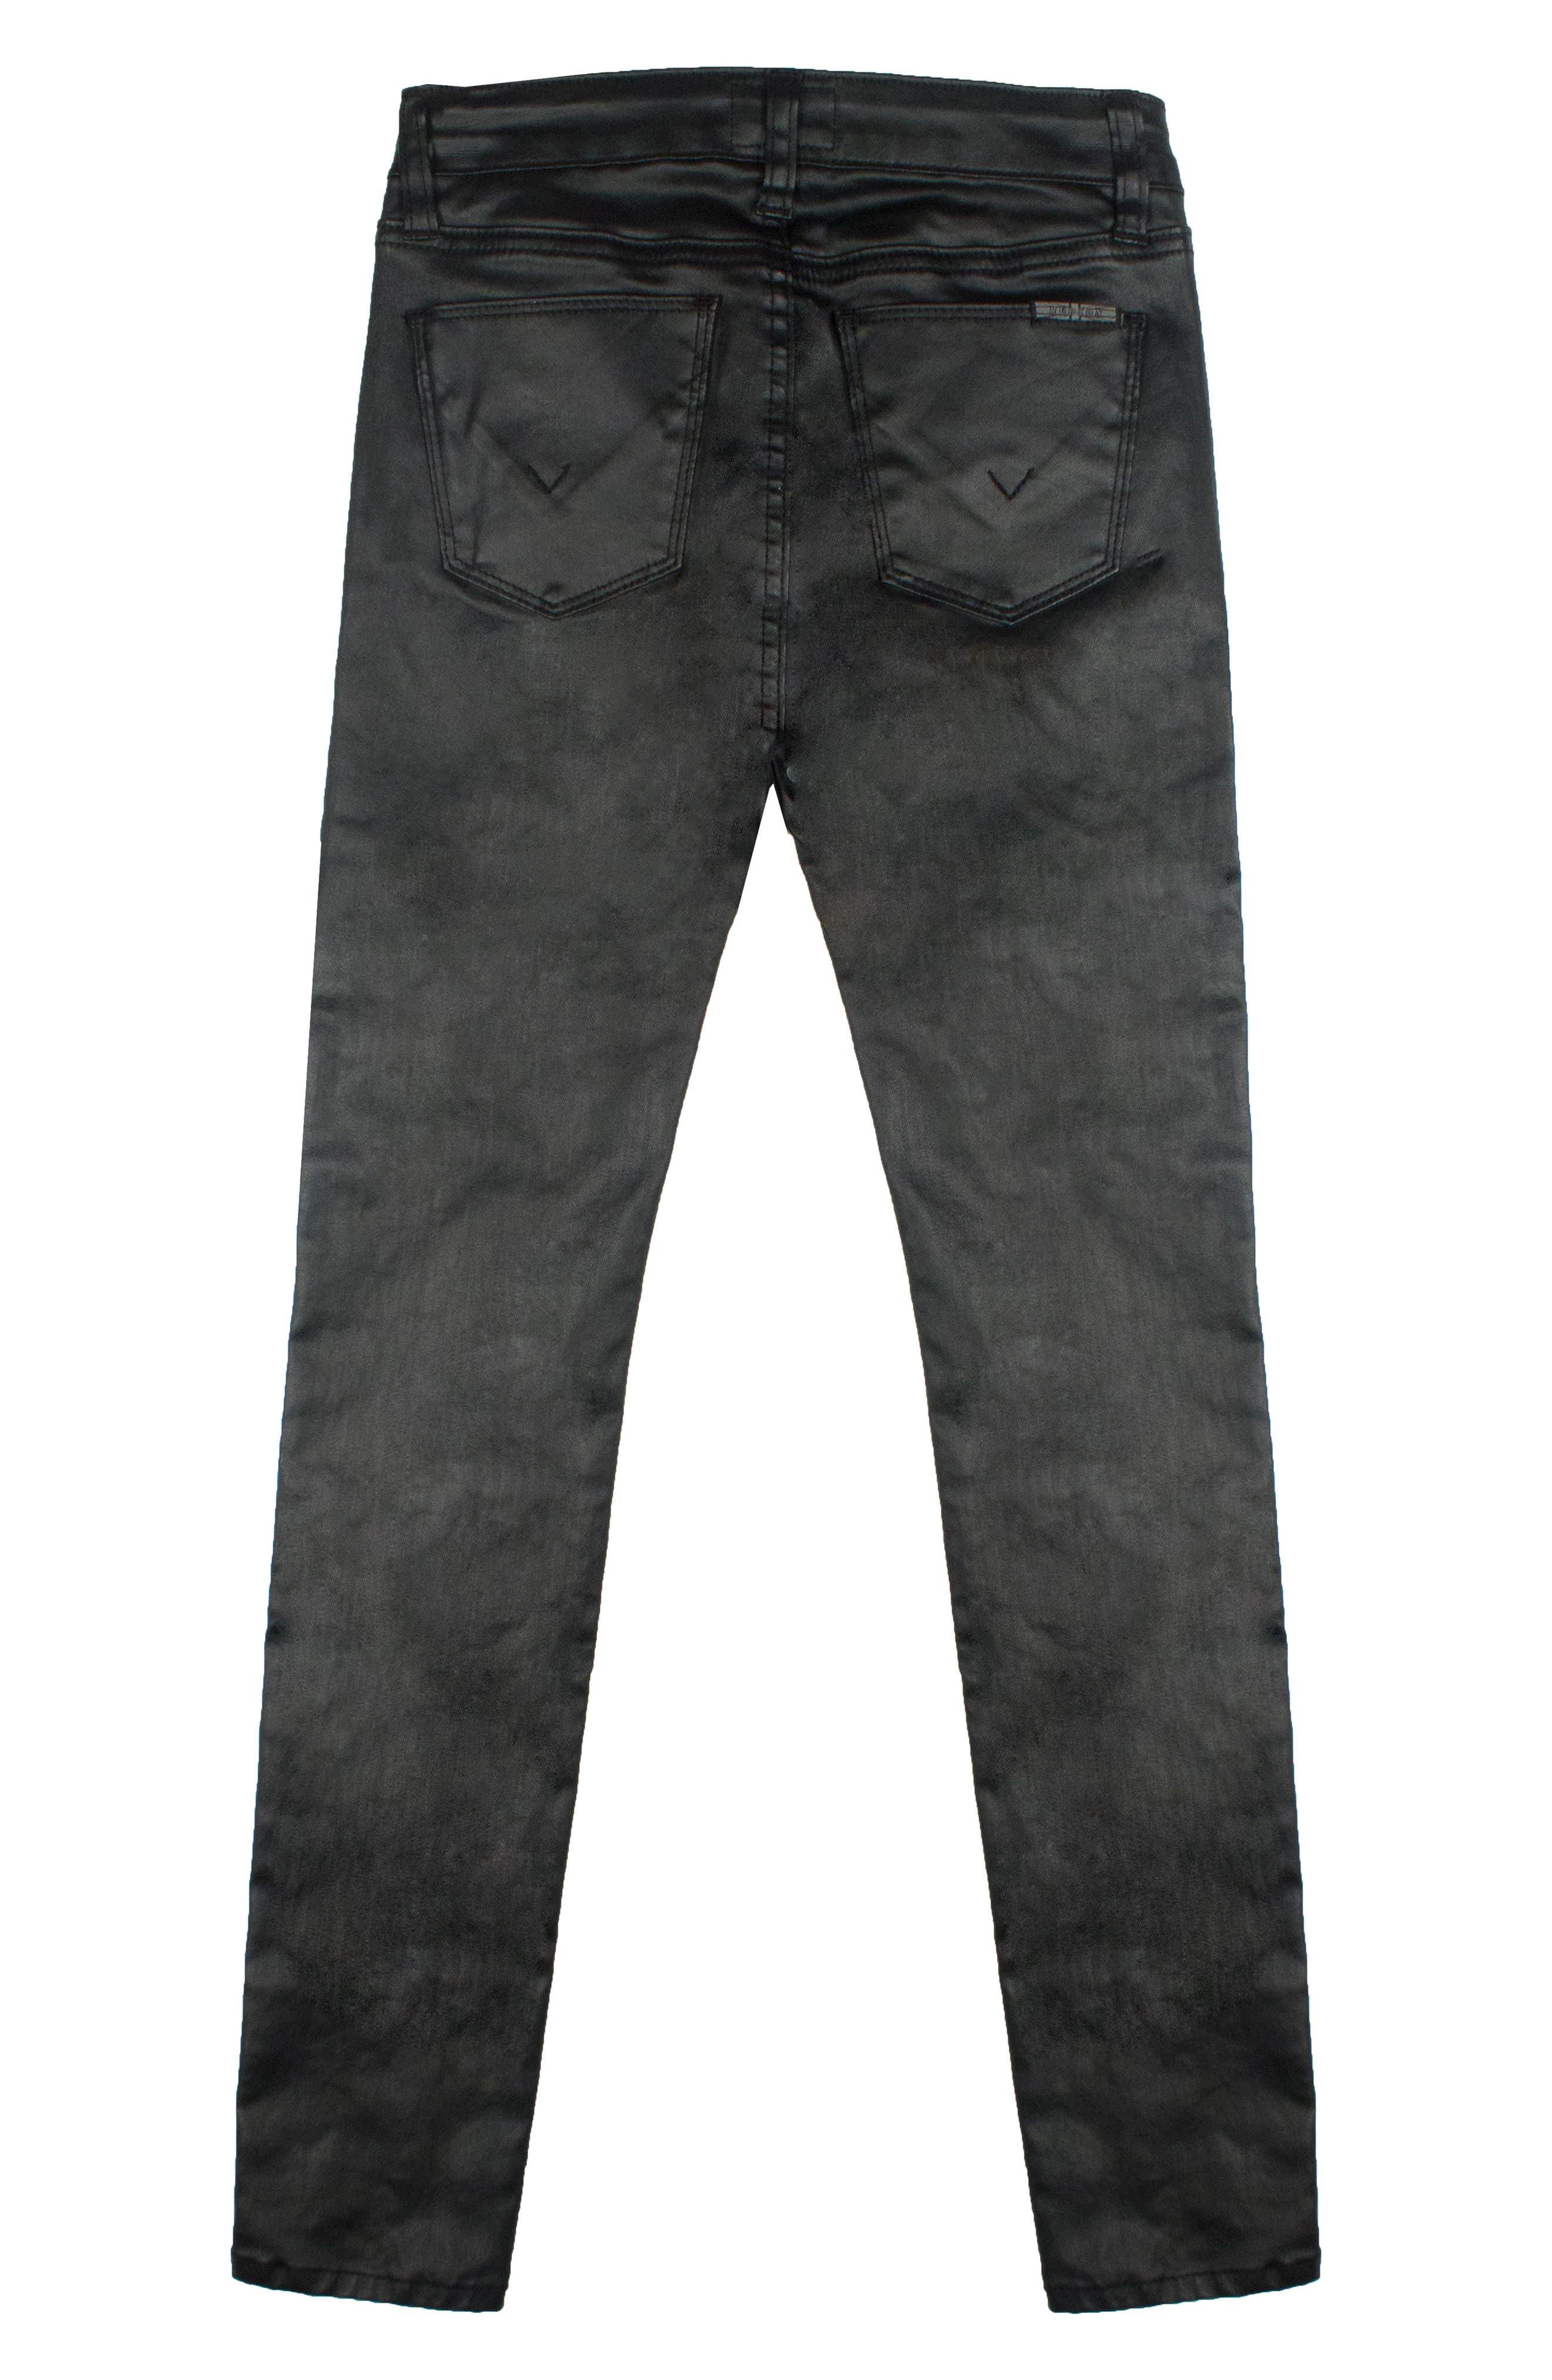 HUDSON KIDS,                             Ziggy Skinny Jeans,                             Alternate thumbnail 2, color,                             003